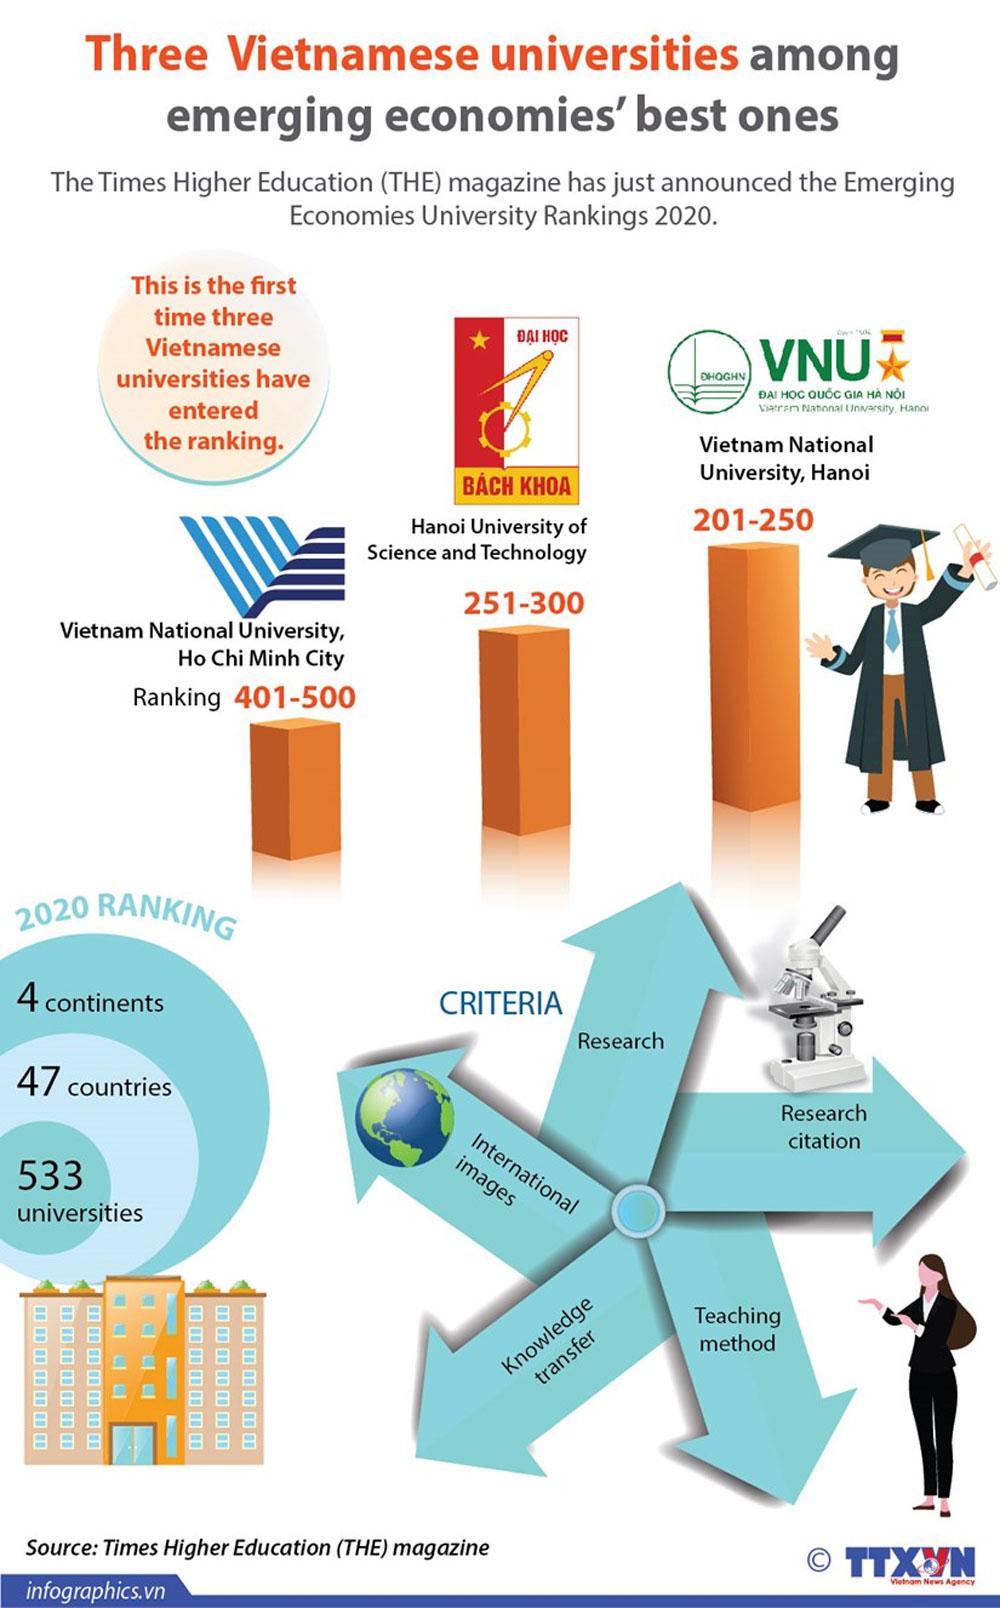 Three Vietnamese universities, emerging economies, best ones, Emerging Economies University Rankings,  Time Higher Education